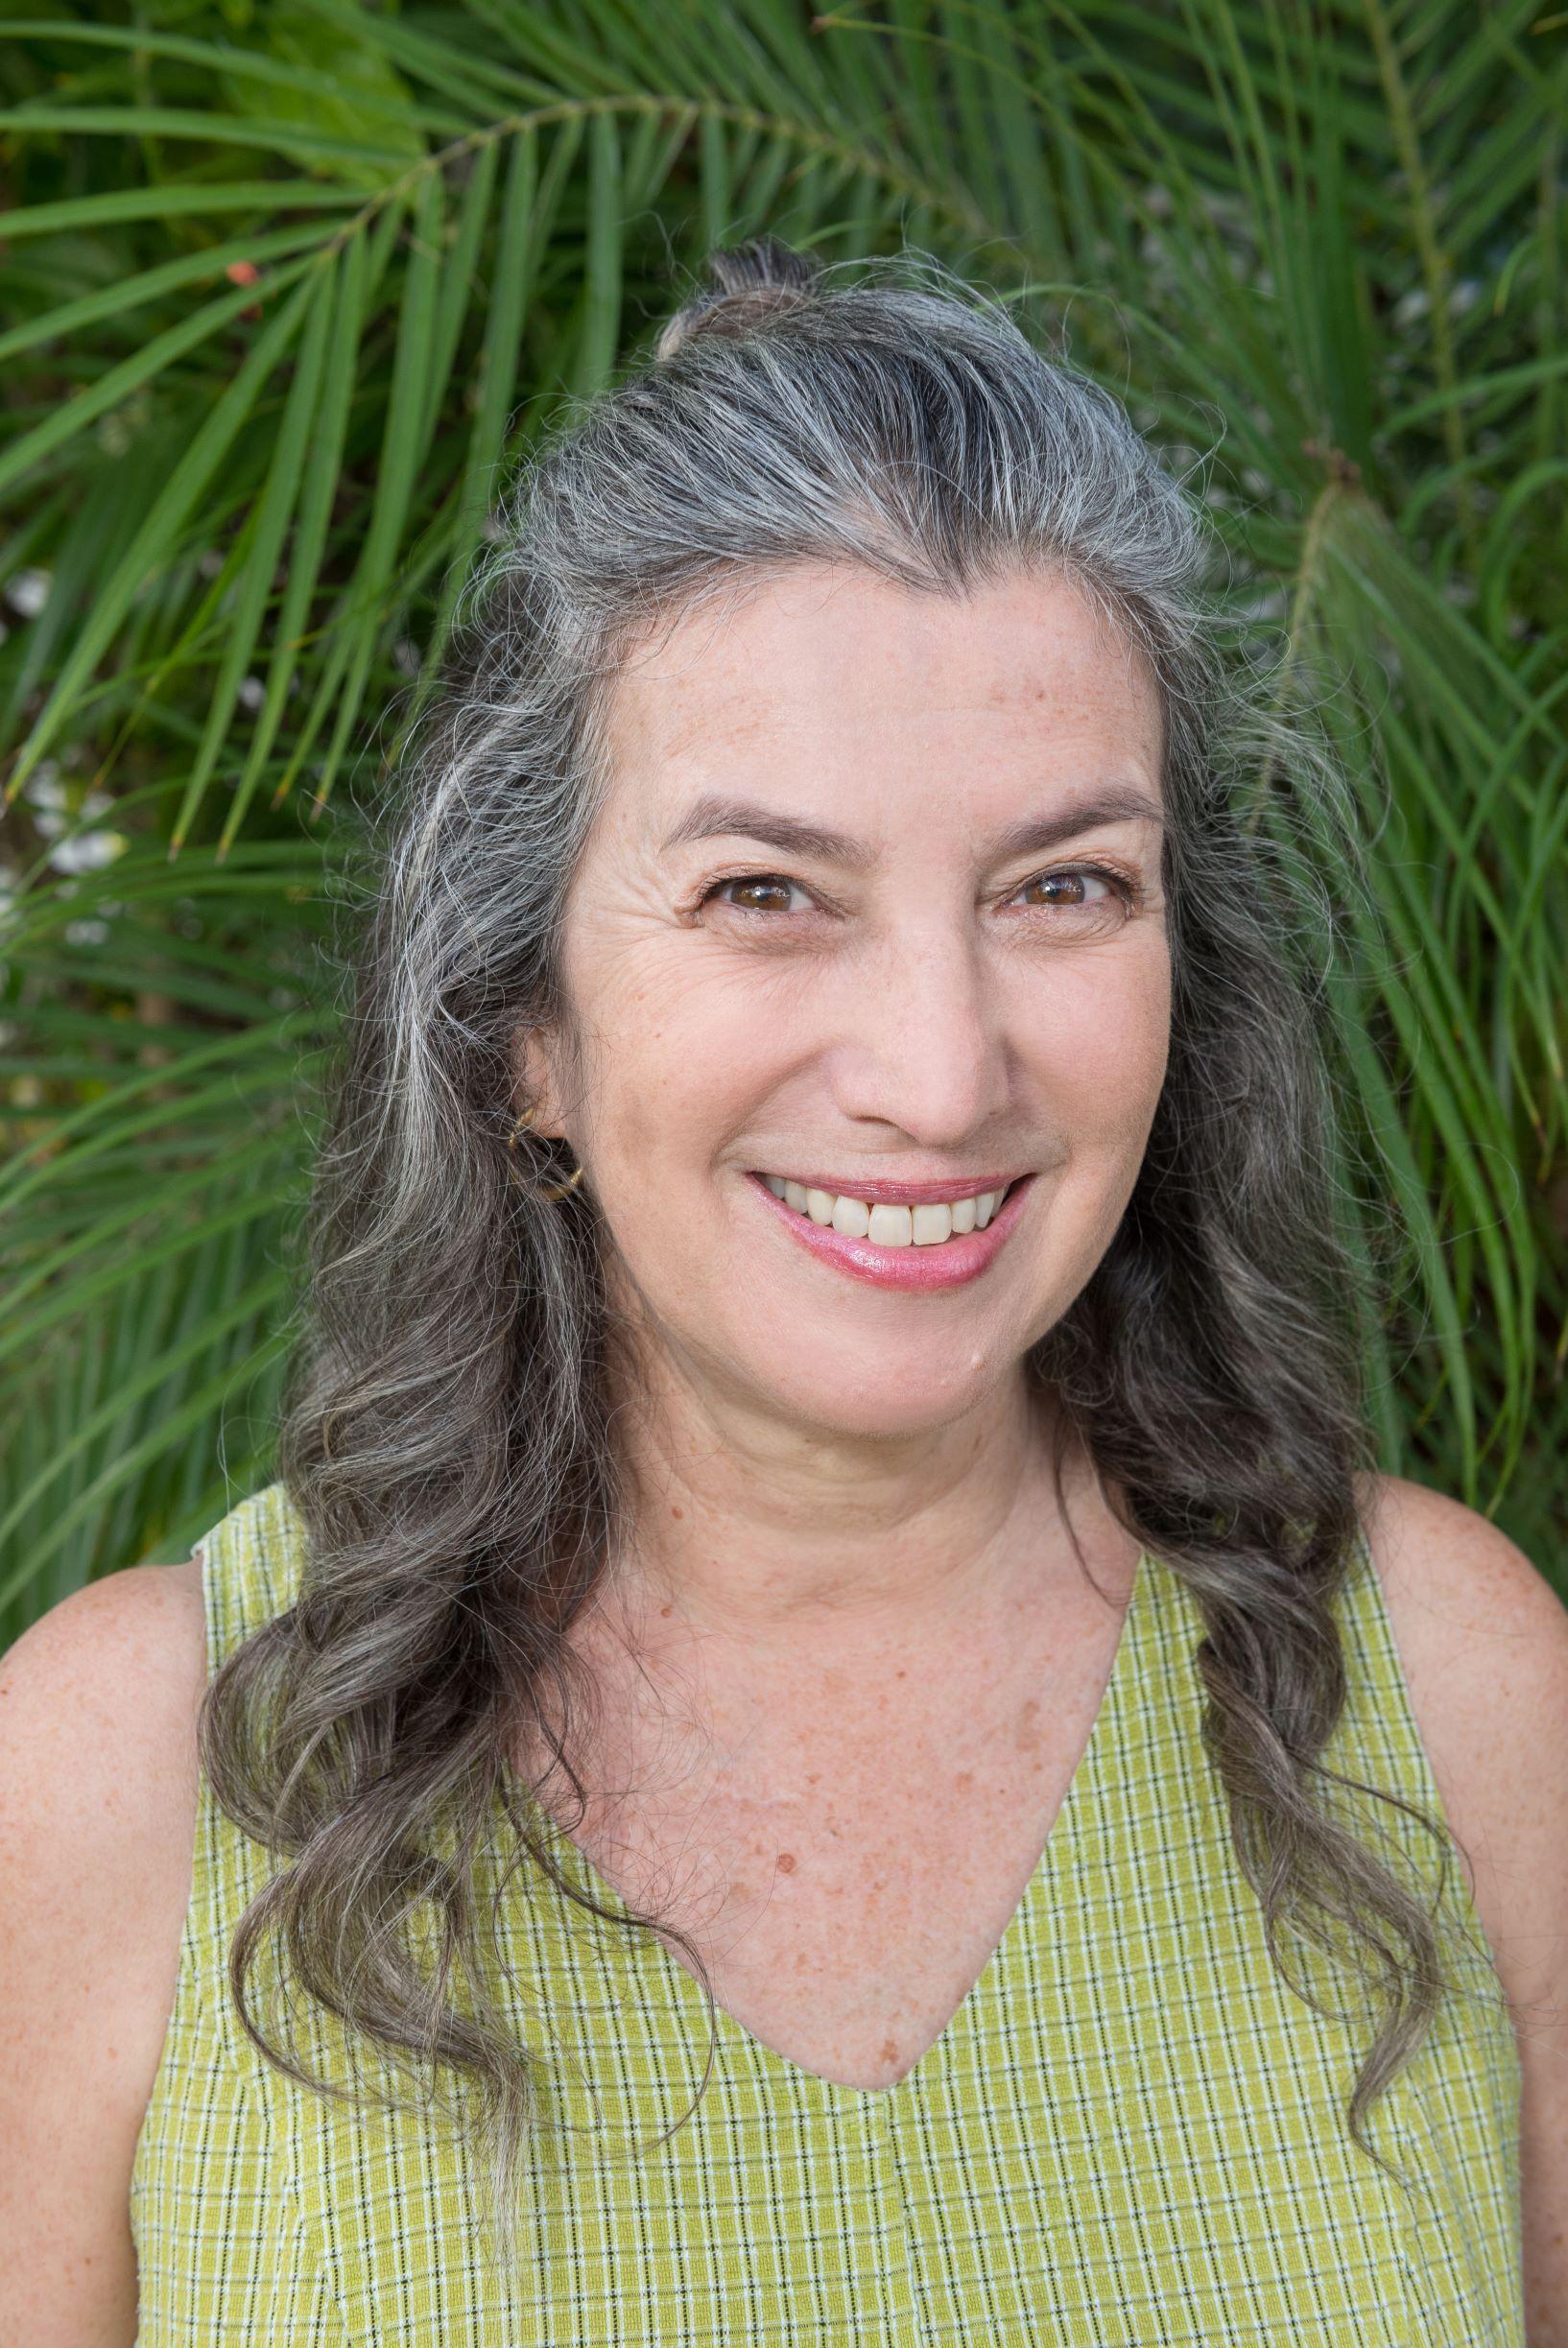 Claudia Coenen: The Karuna Project